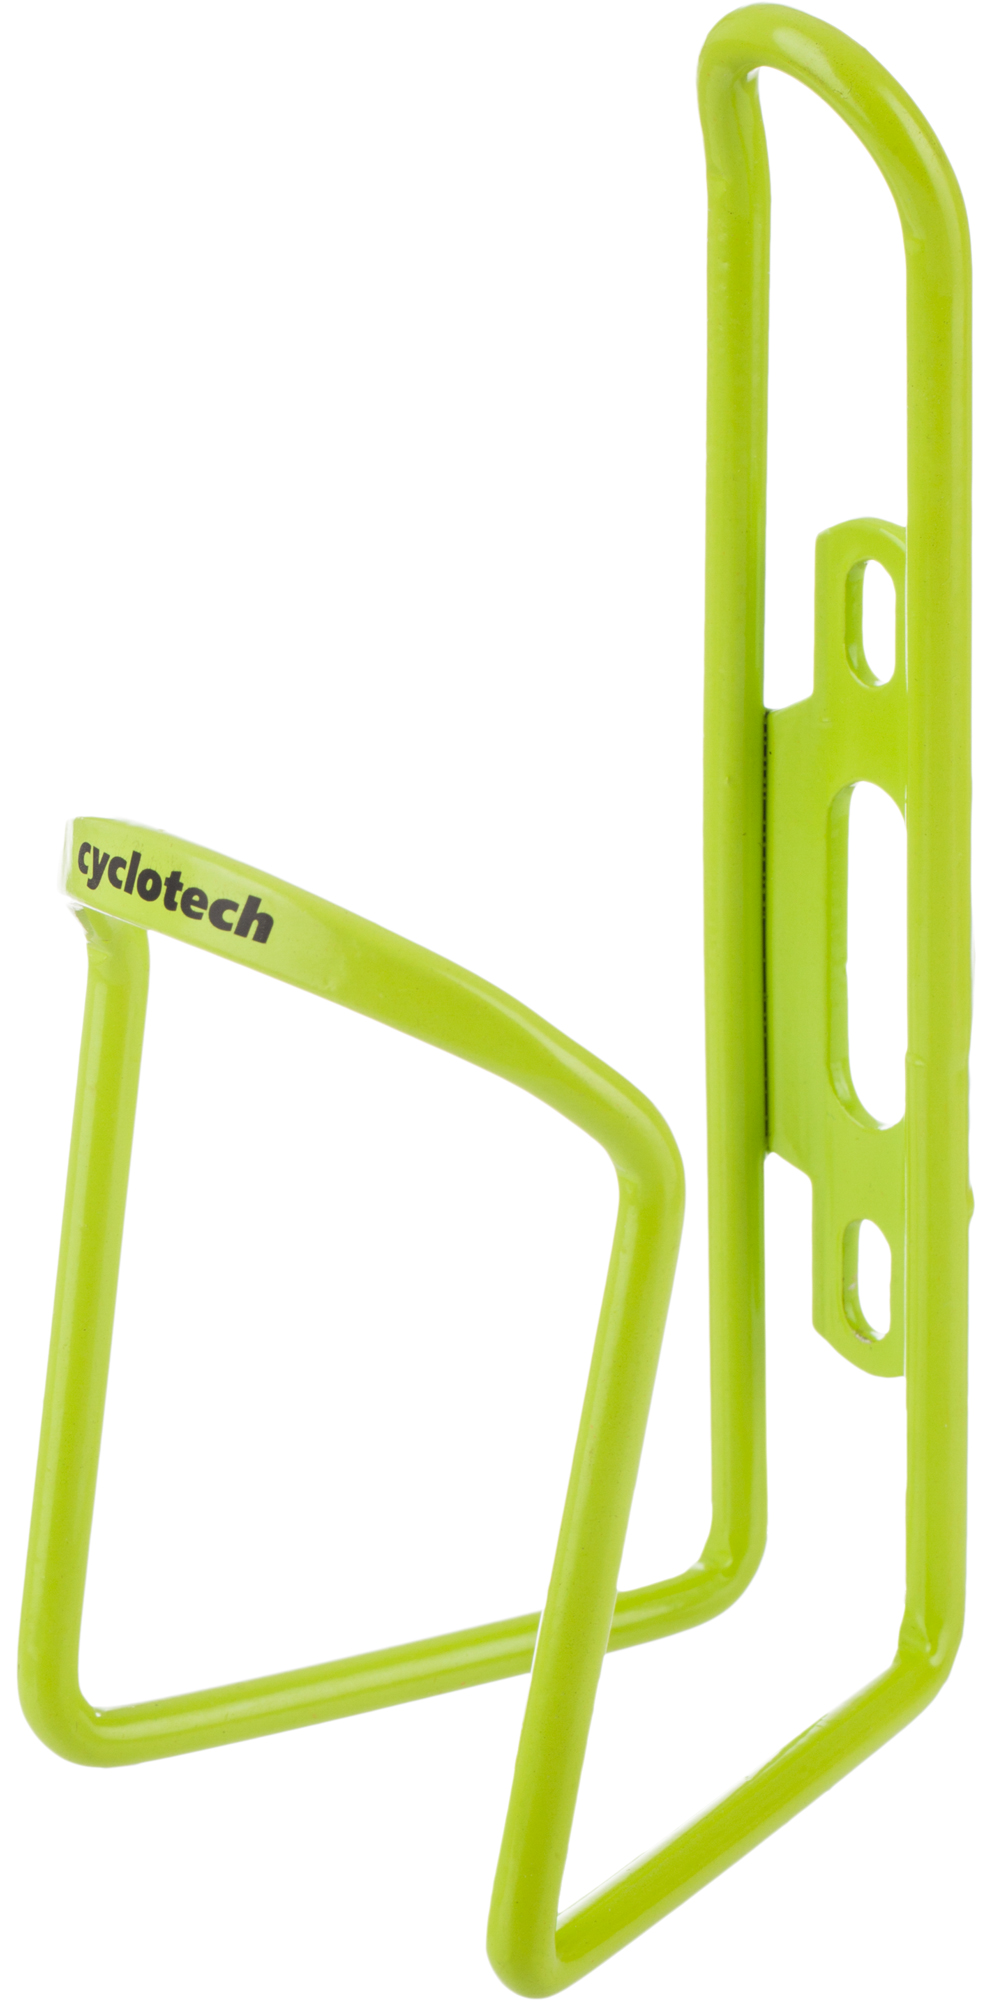 цена на Cyclotech Флягодержатель Cyclotech